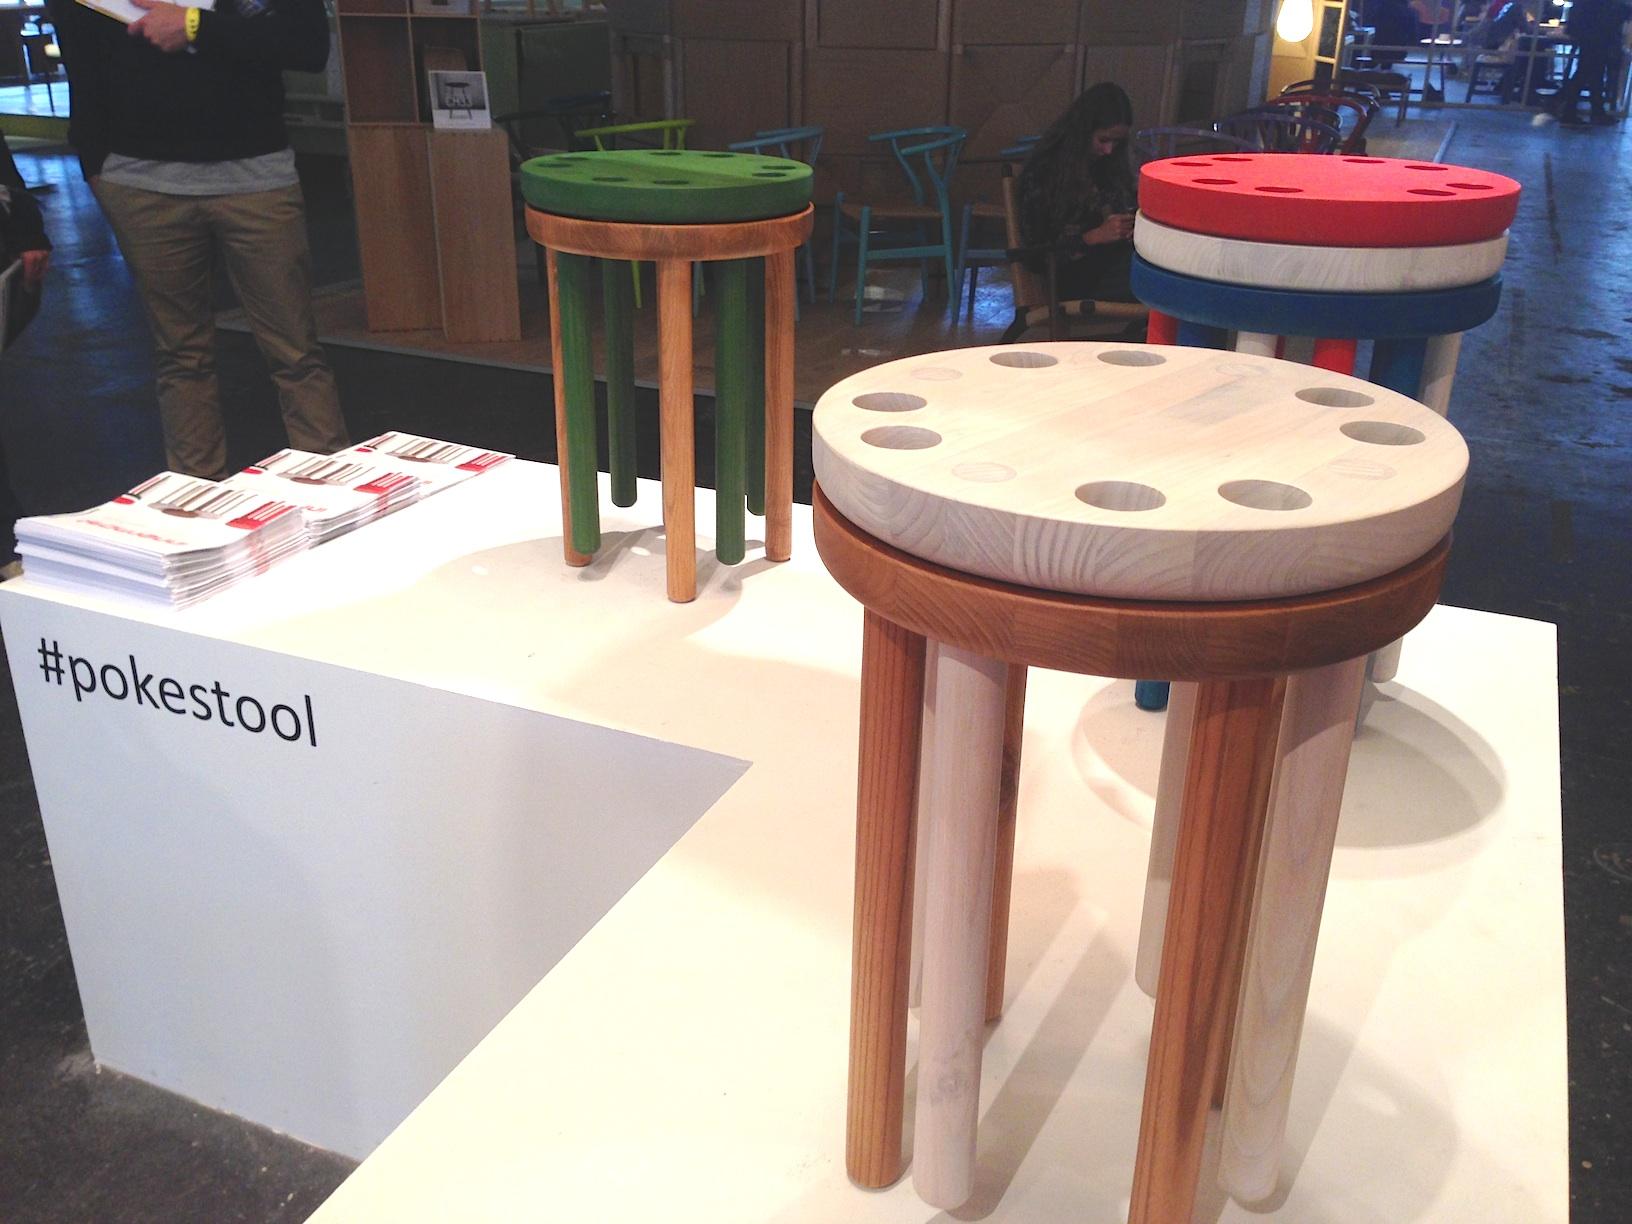 Design Junction London 2013 - pokestool